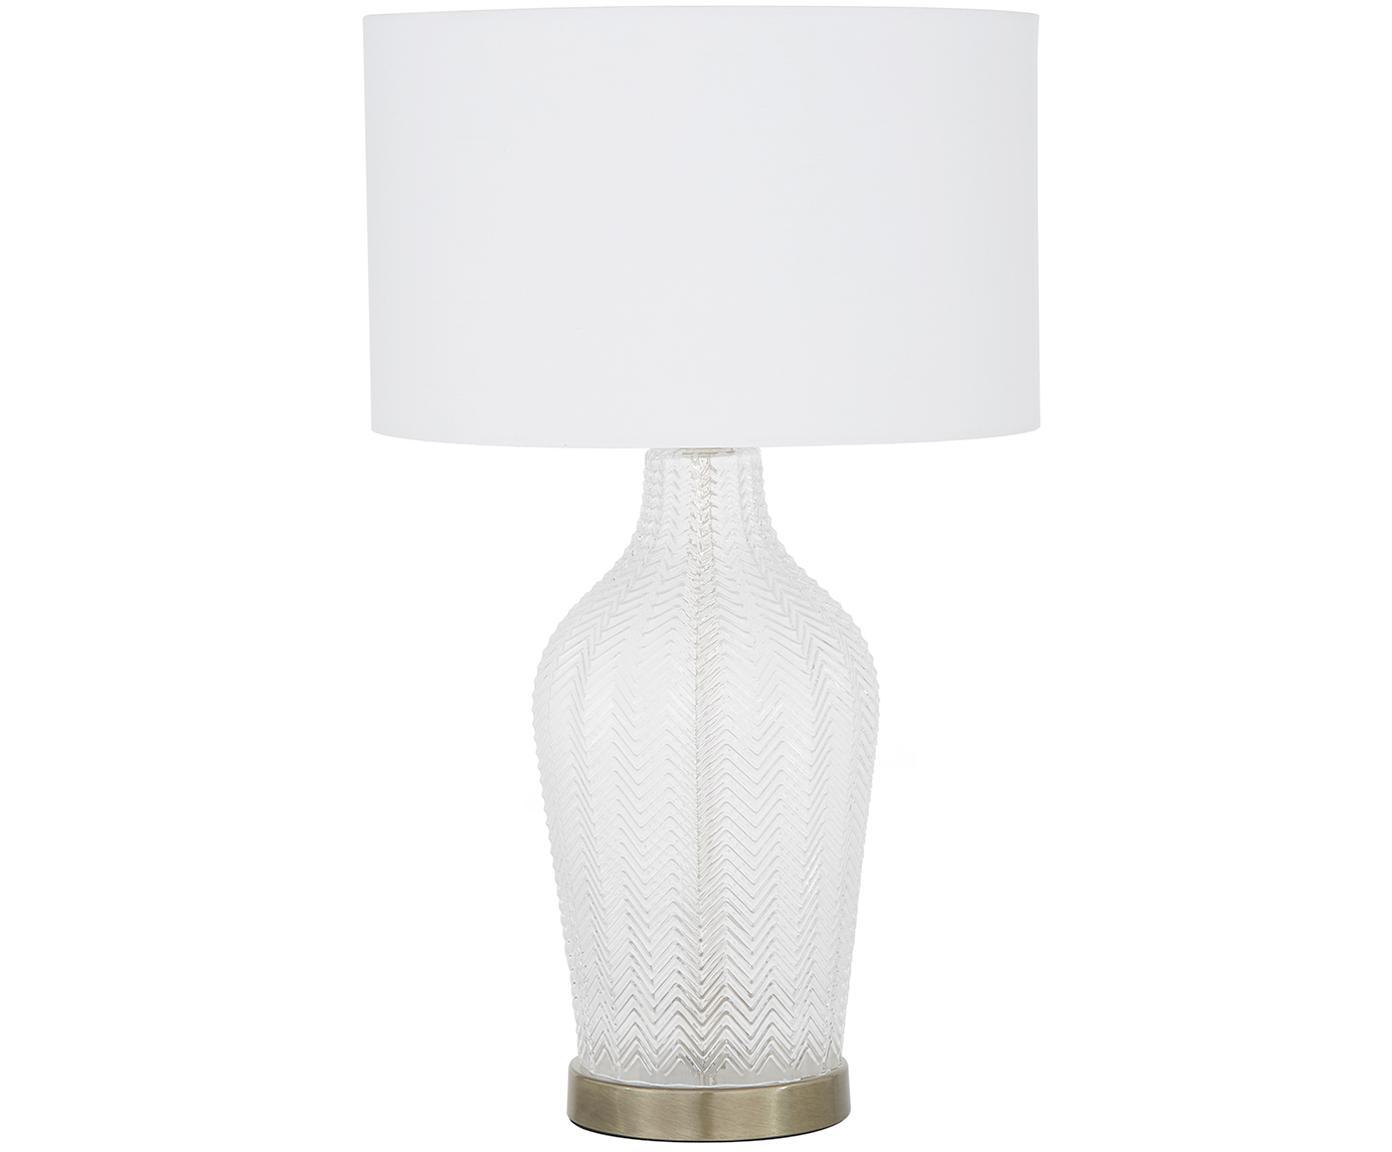 Tischleuchte Sue, Lampenschirm: Textil, Lampenfuß: Glas, Metall, vermessingt, Lampenschirm: Weiss Lampenfuss: Transparent, Messing, gebürstet, Ø 33 x H 55 cm